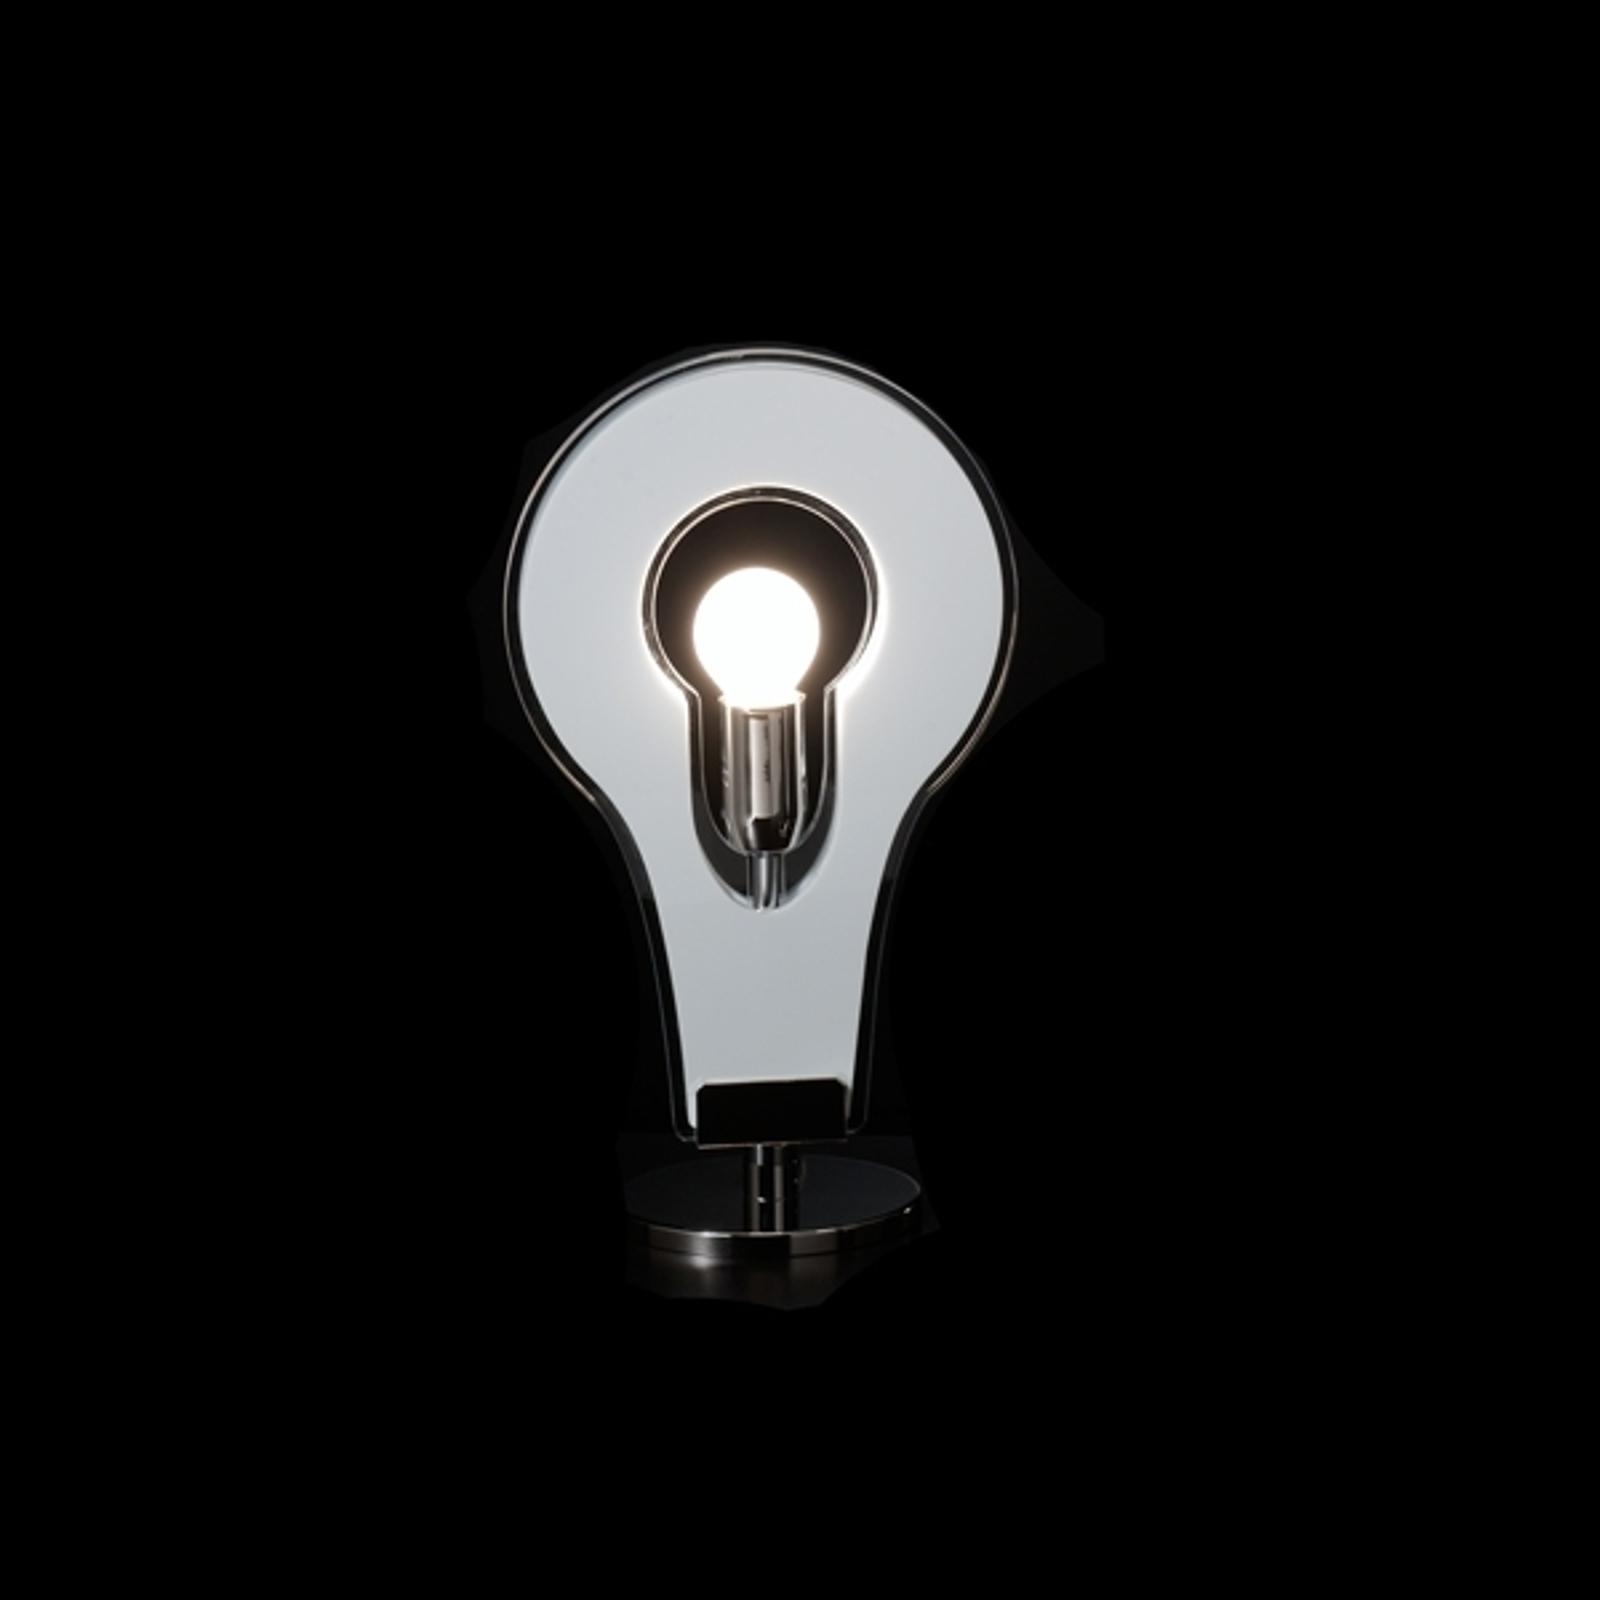 Vit, storslagen bordslampa Flat 32